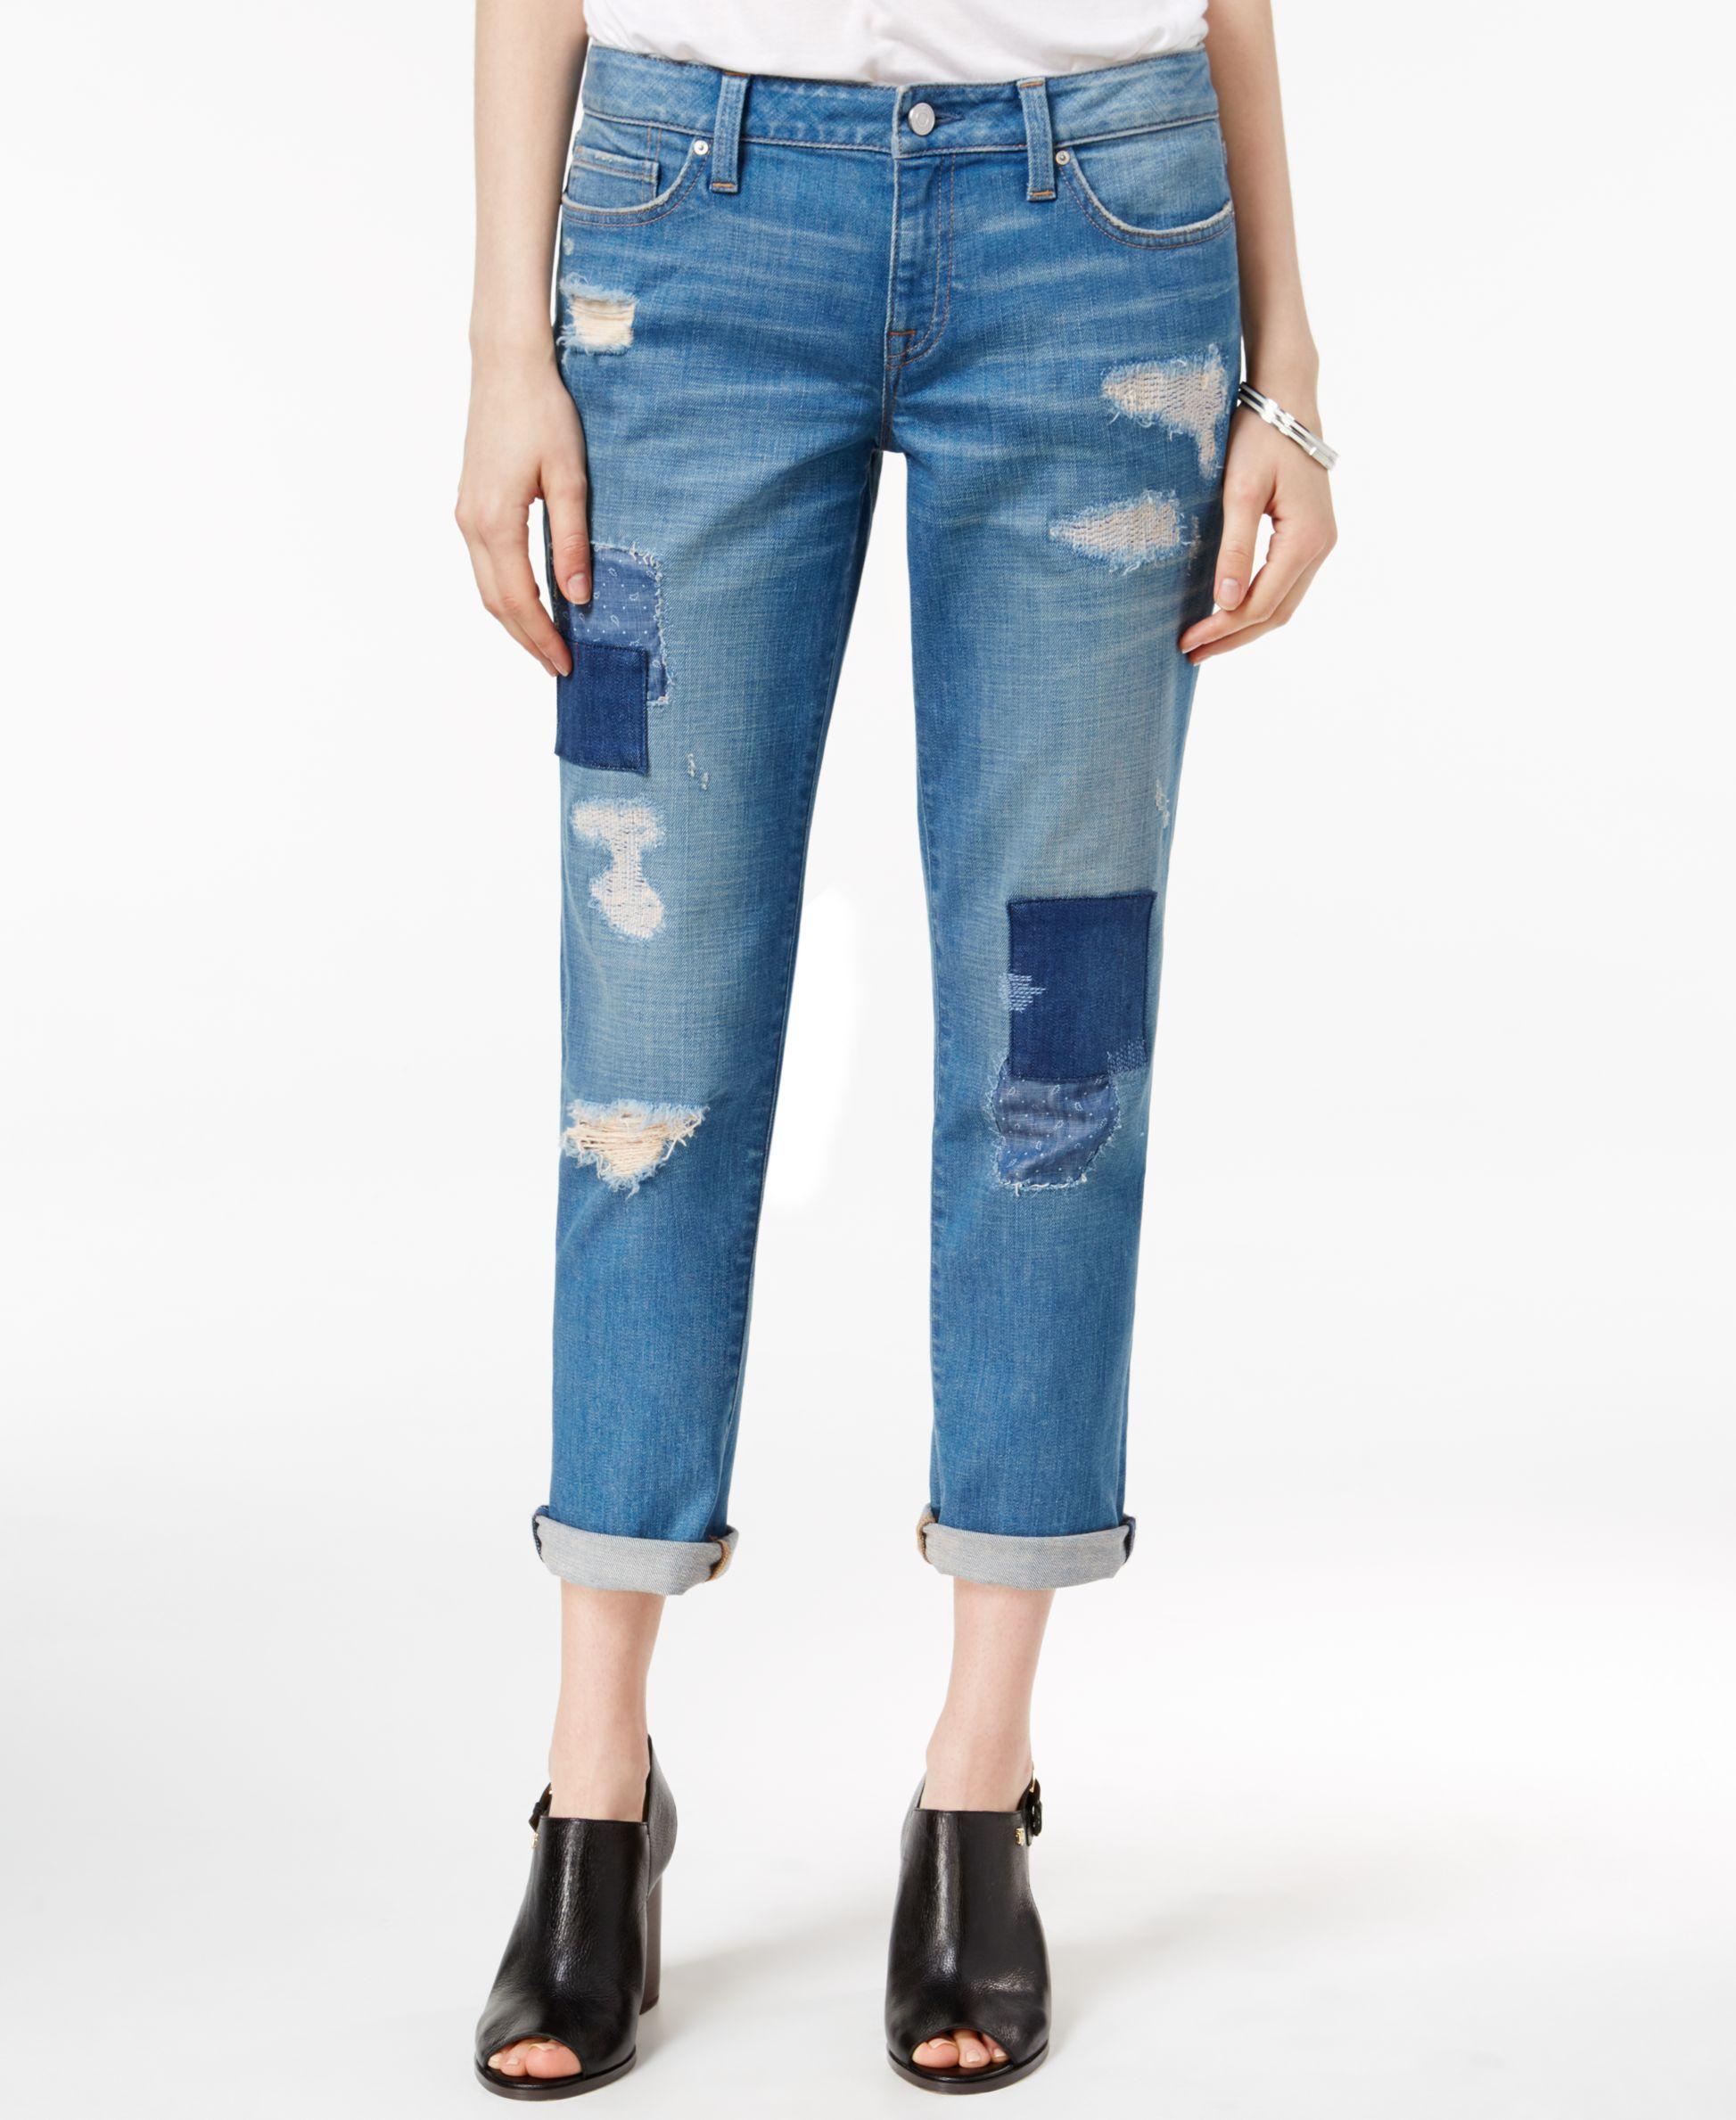 4c93826bab5 Tommy Hilfiger Paisley Ripped Medium Blue Wash Boyfriend Jeans ...